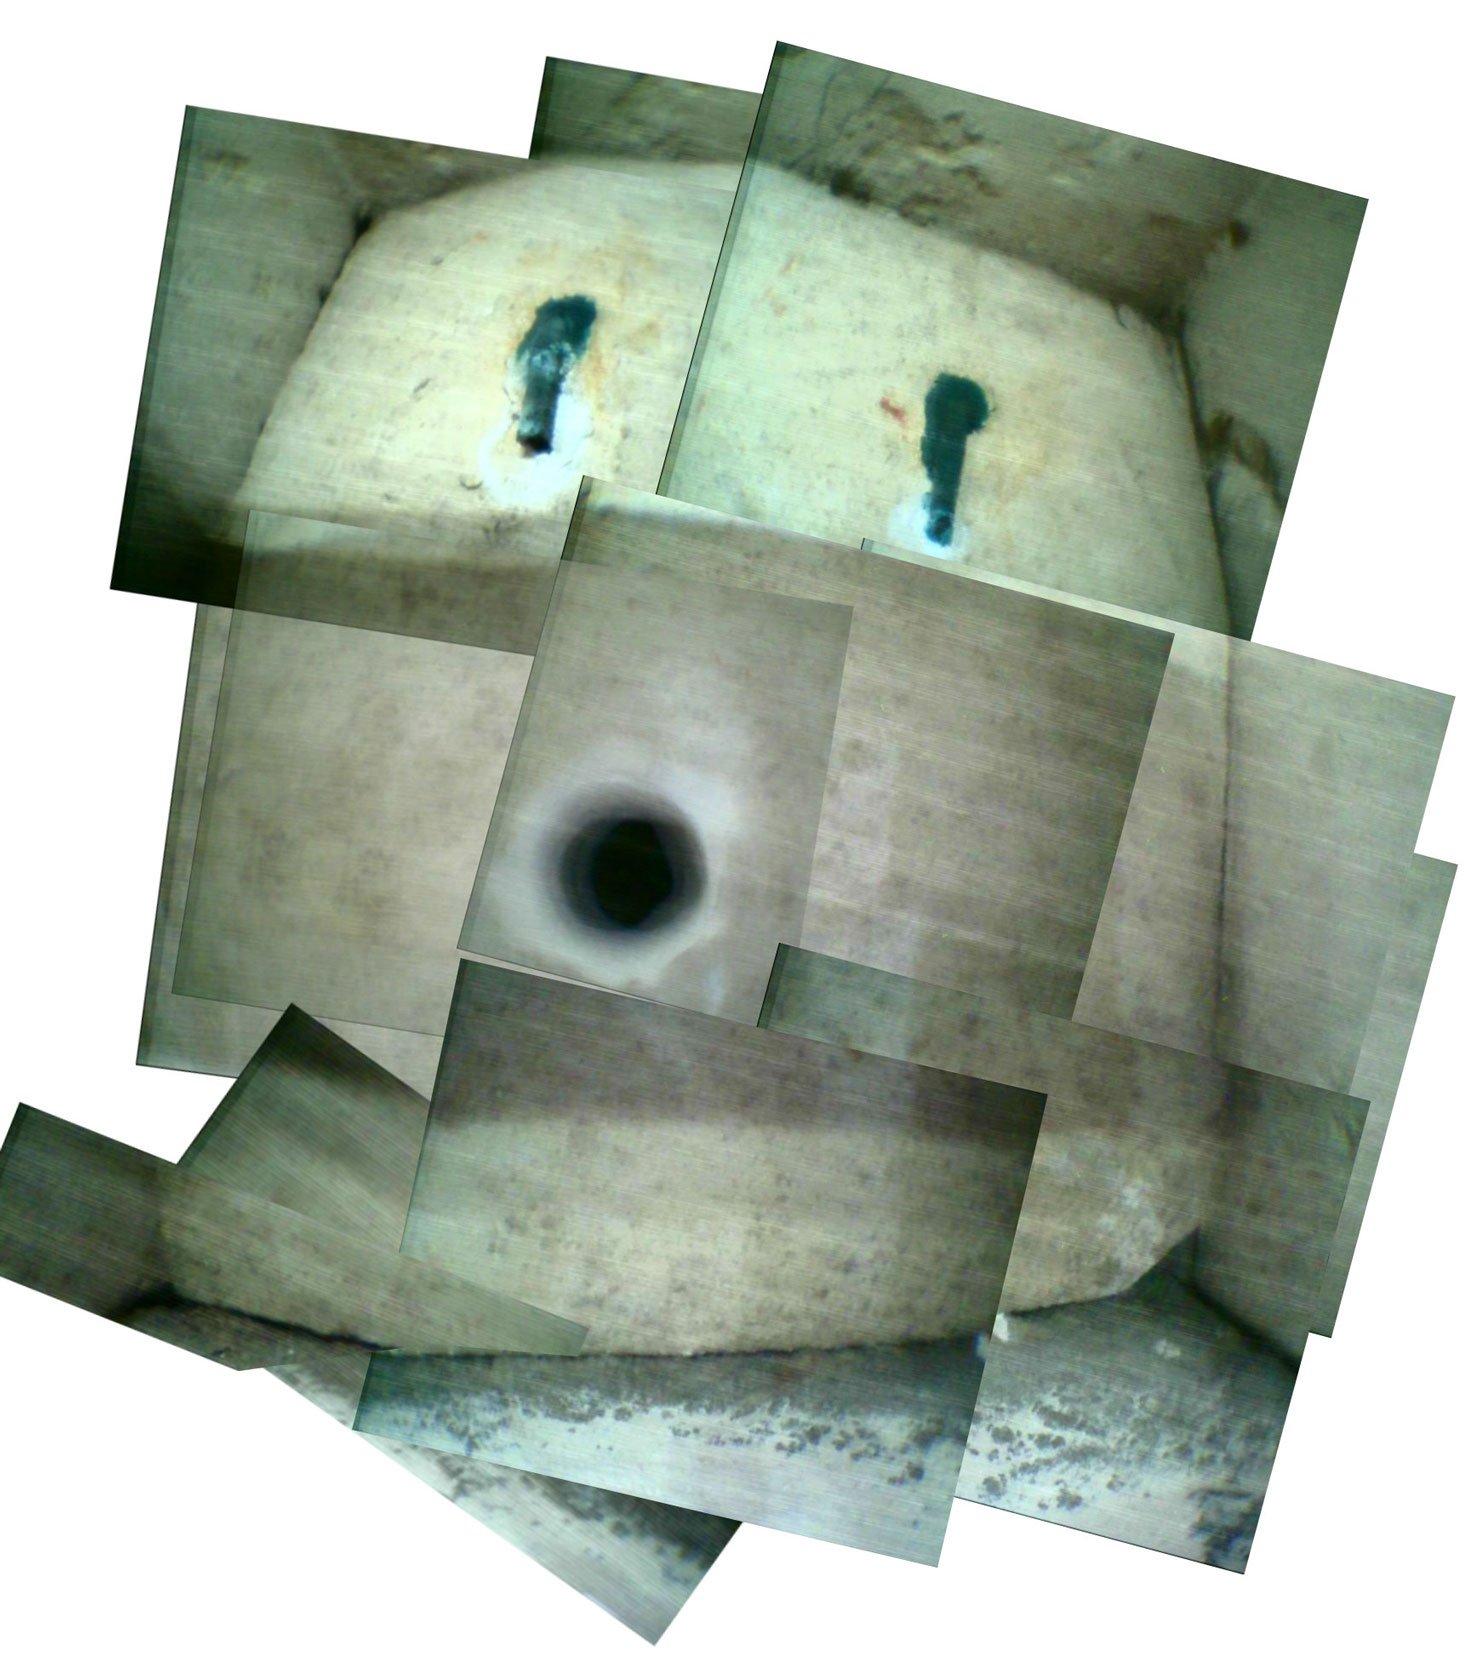 Composite image